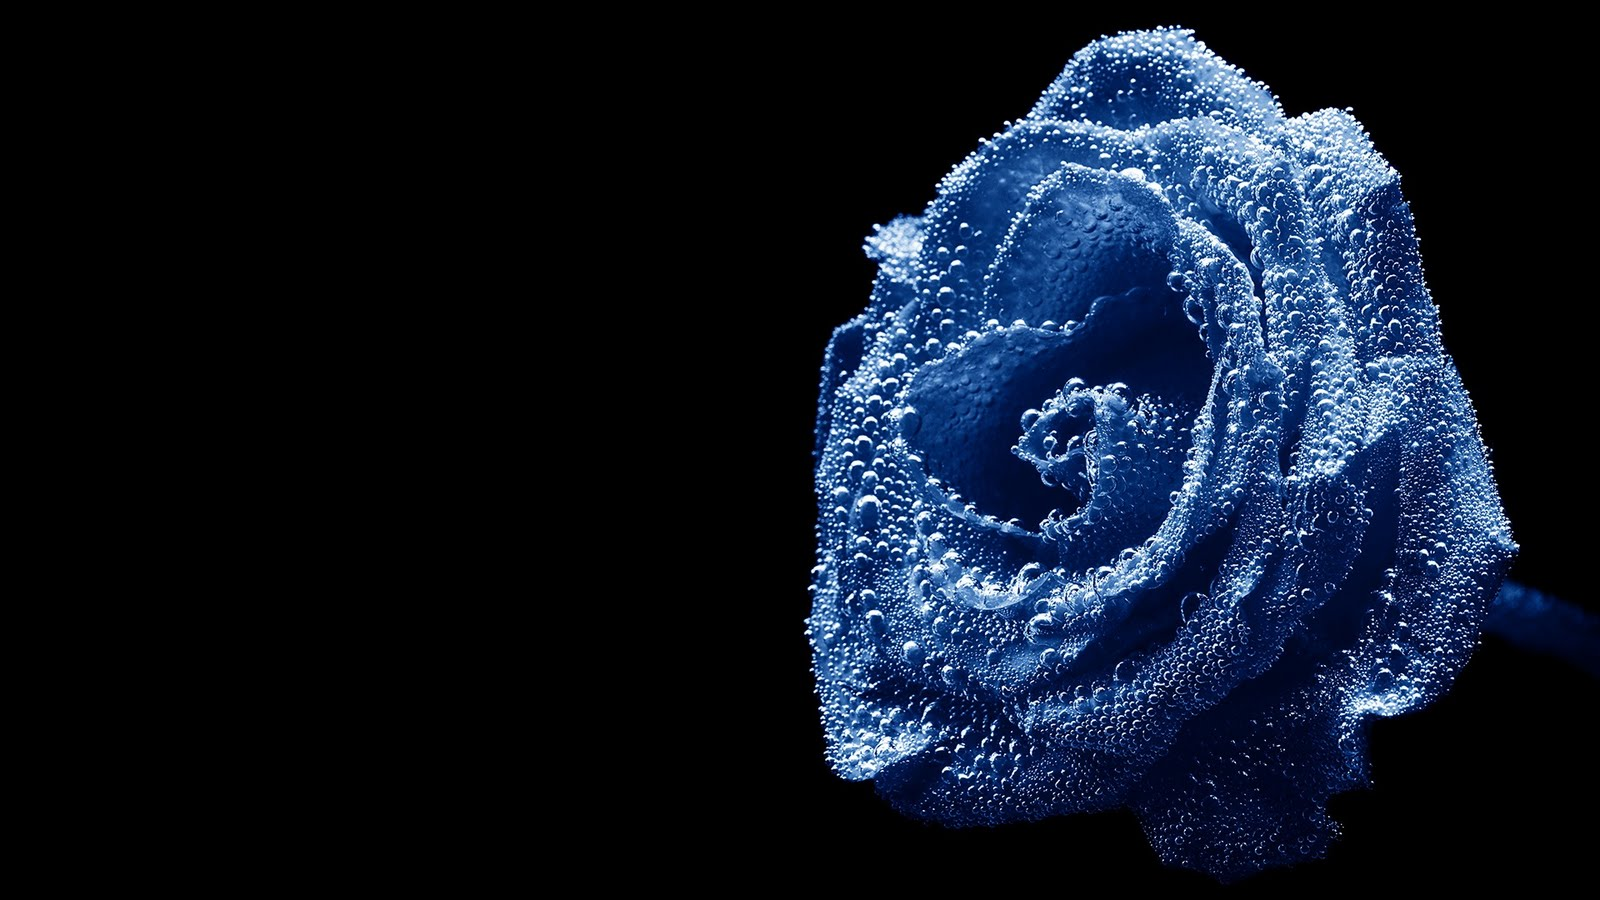 blue roses 29661